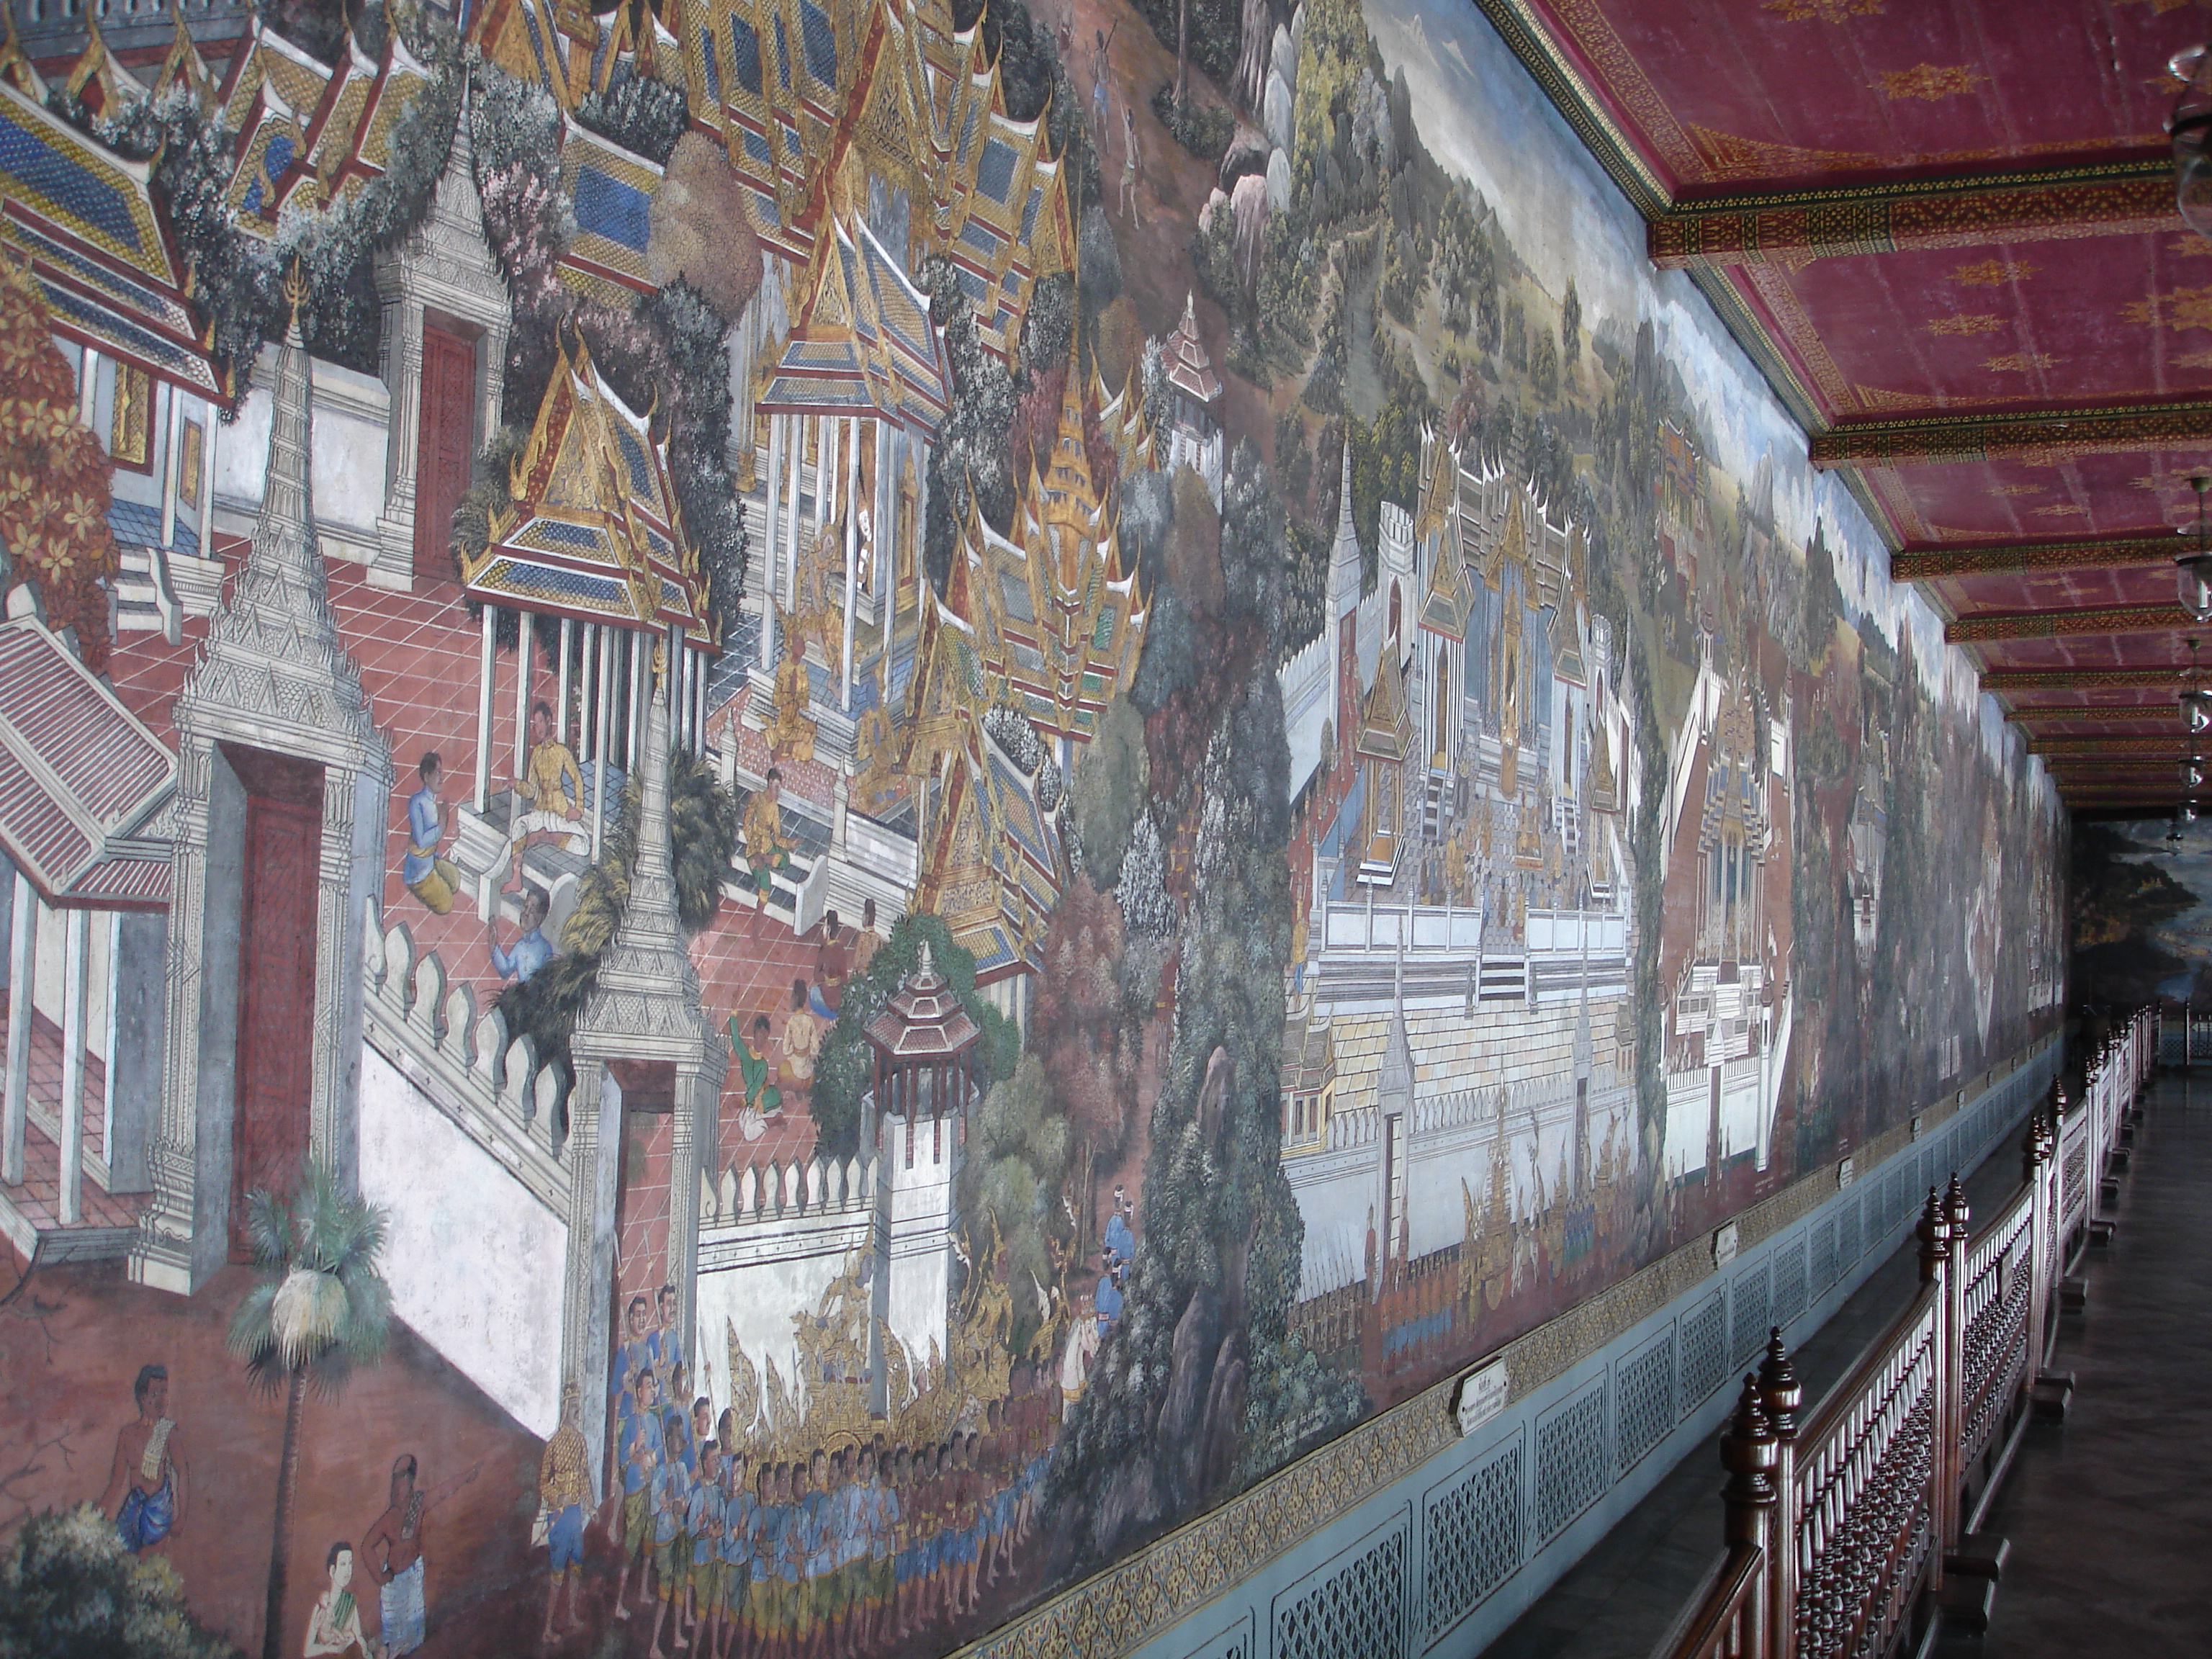 Murals at the Grand Palace in Bangkok. Photos taken by Mark Jochim on May 17, 2006.